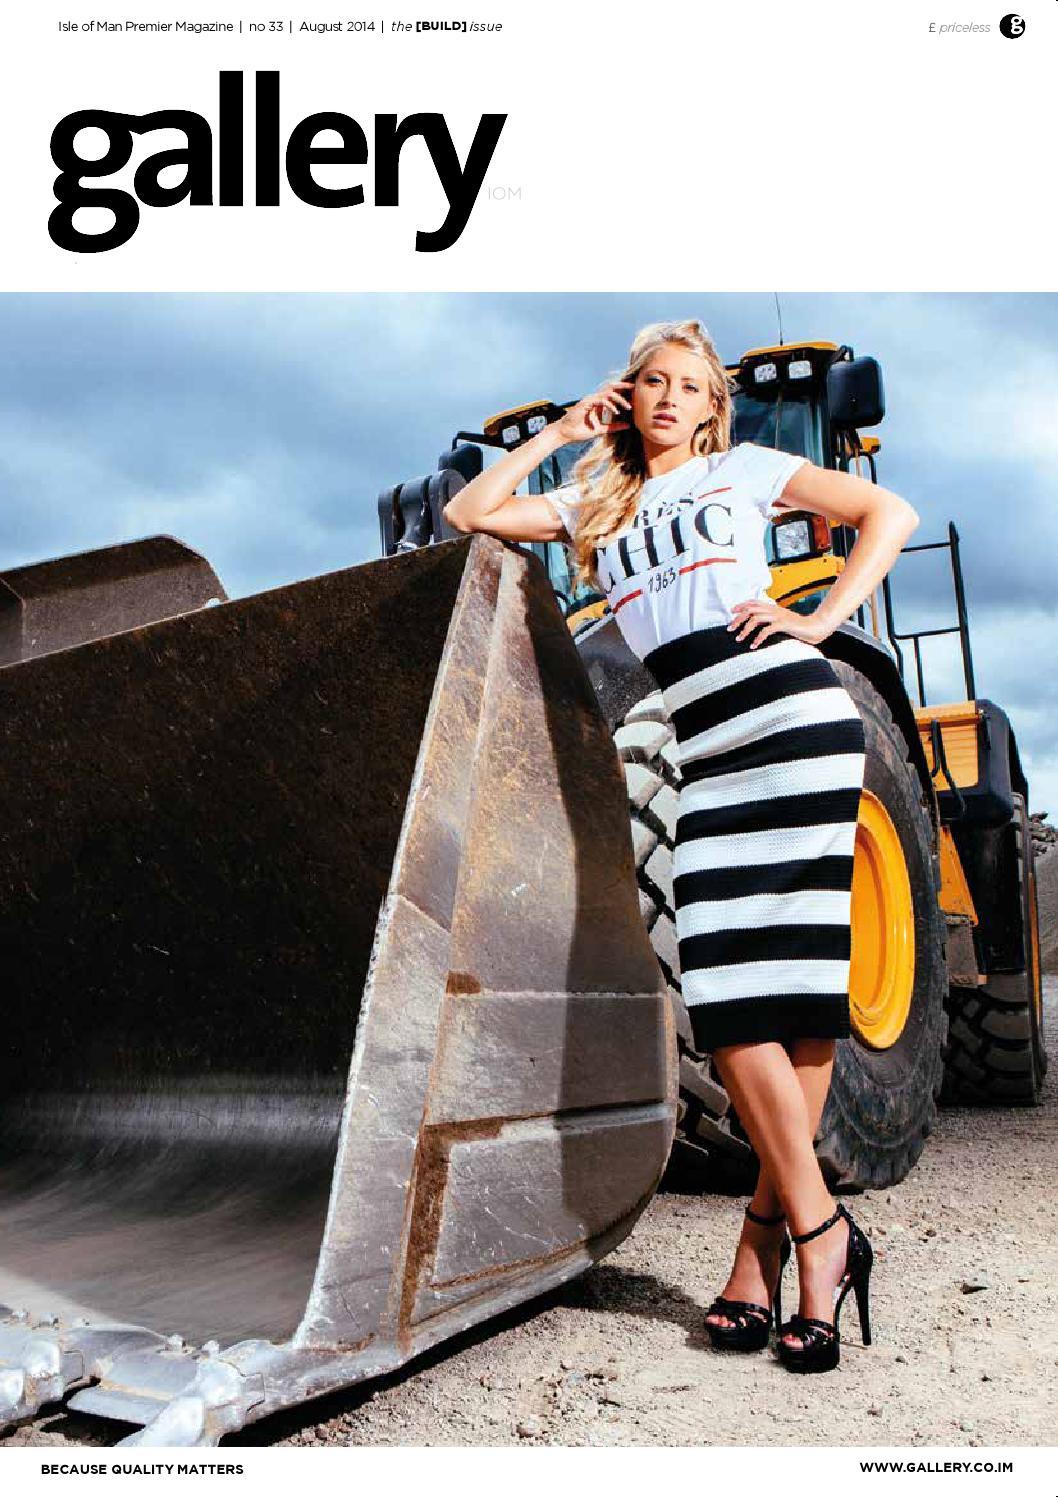 Gallery August 2014 The Build Issue By Isle Of Man Media Issuu Krezi Kamis 26 Mont Blanc Emblem Set Edt 100ml